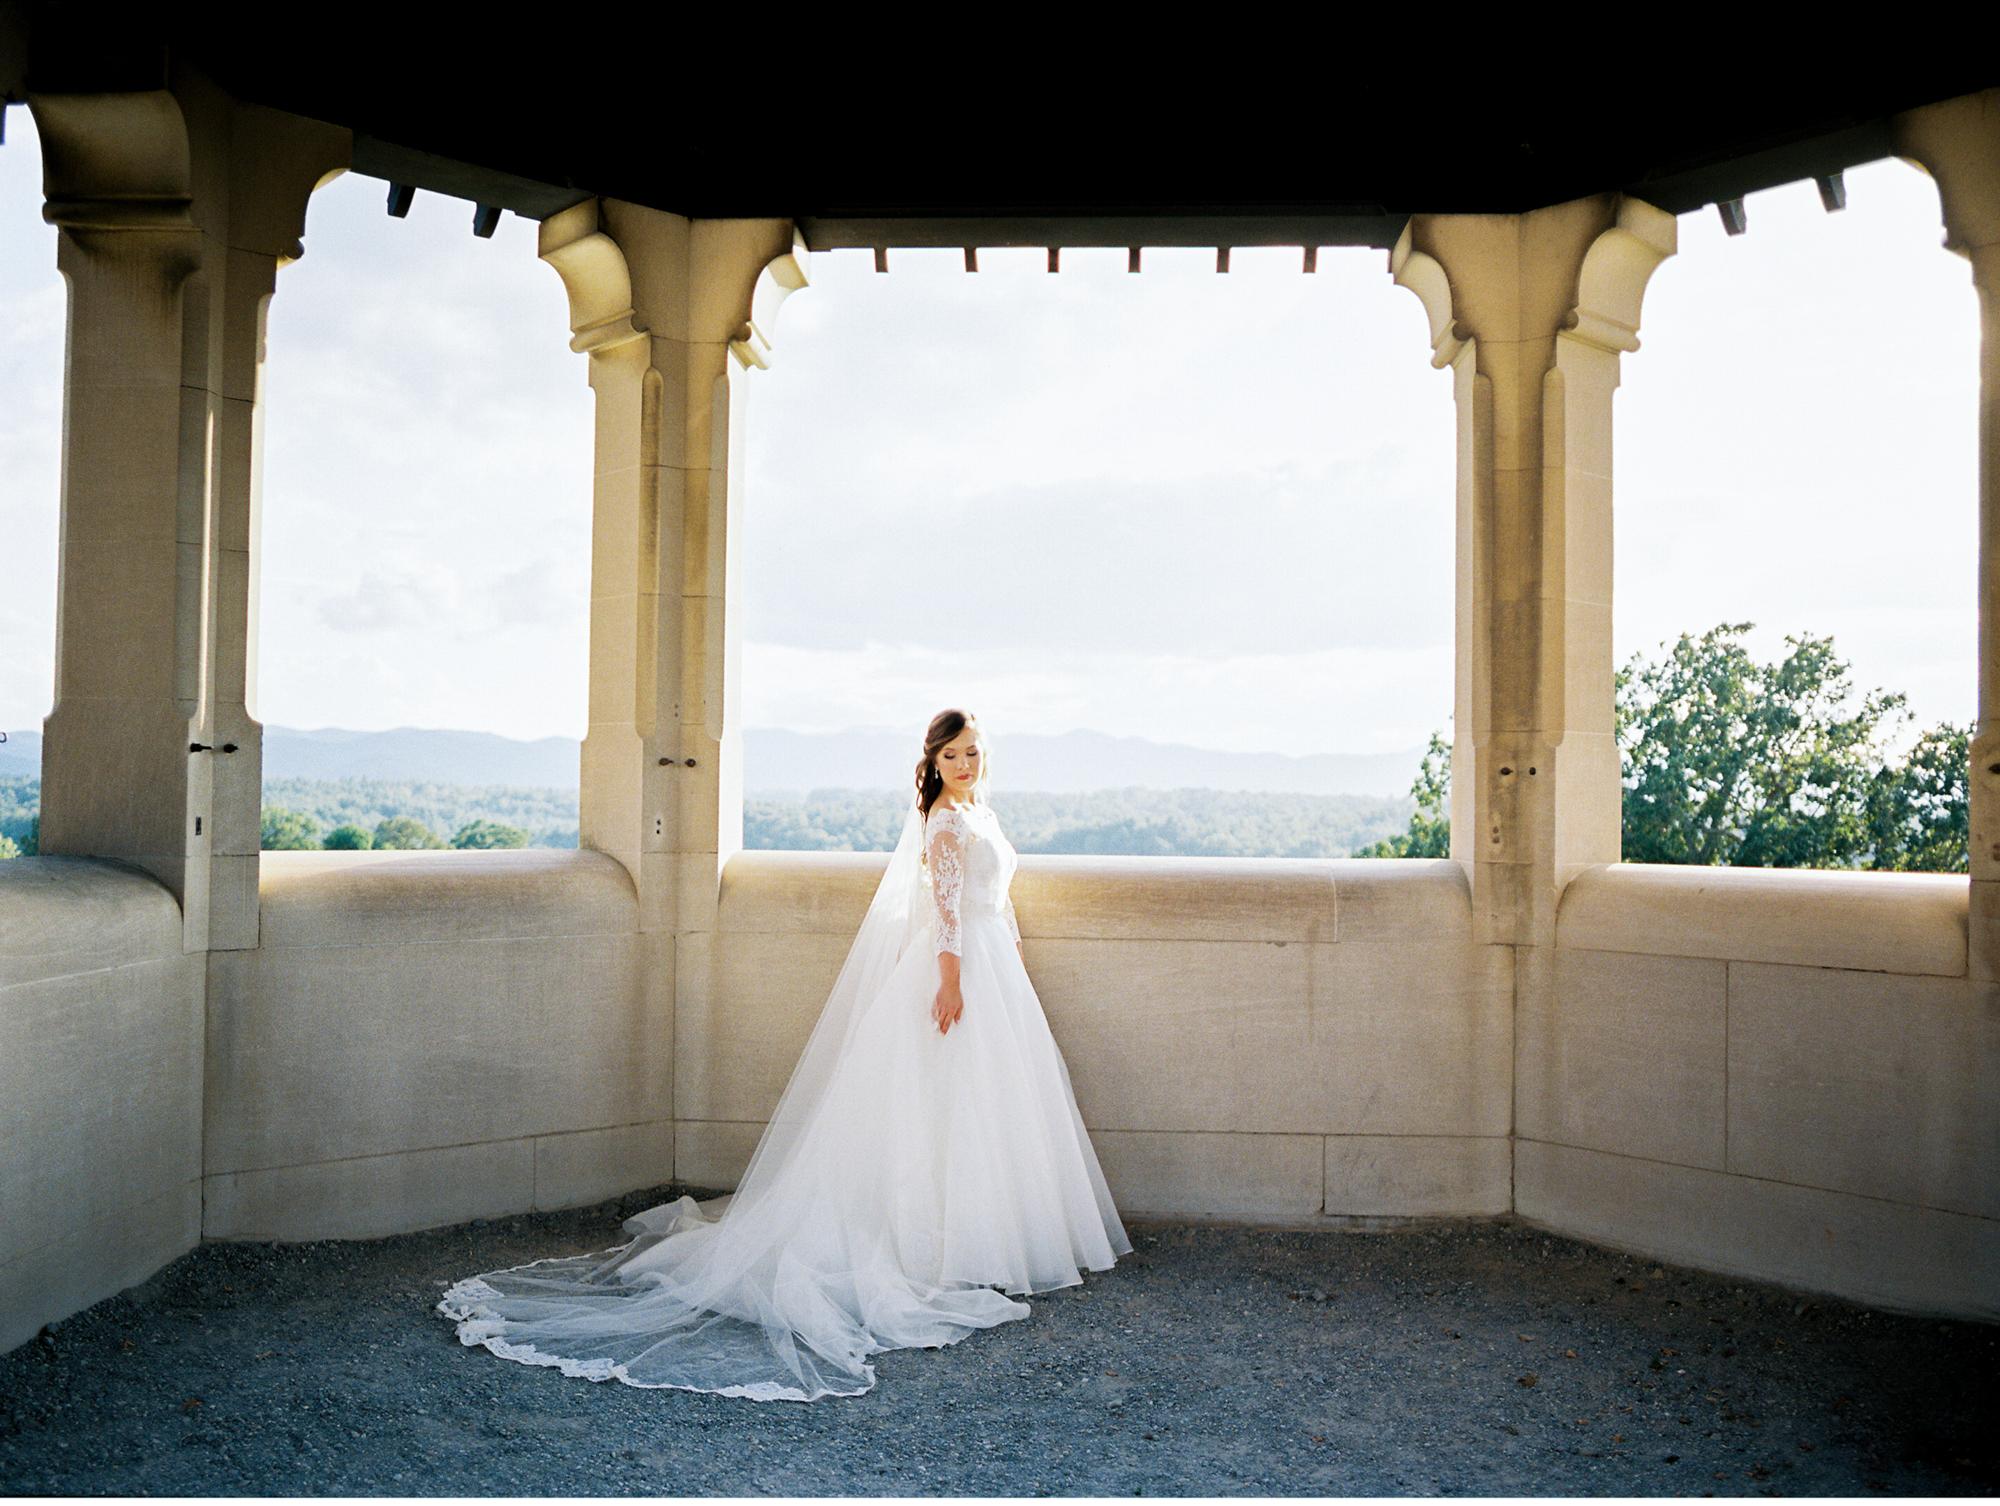 timeless-classy-cathedral-veil-bridal-session-biltmore-north-carolina-wedding-film-photographer-8.jpg